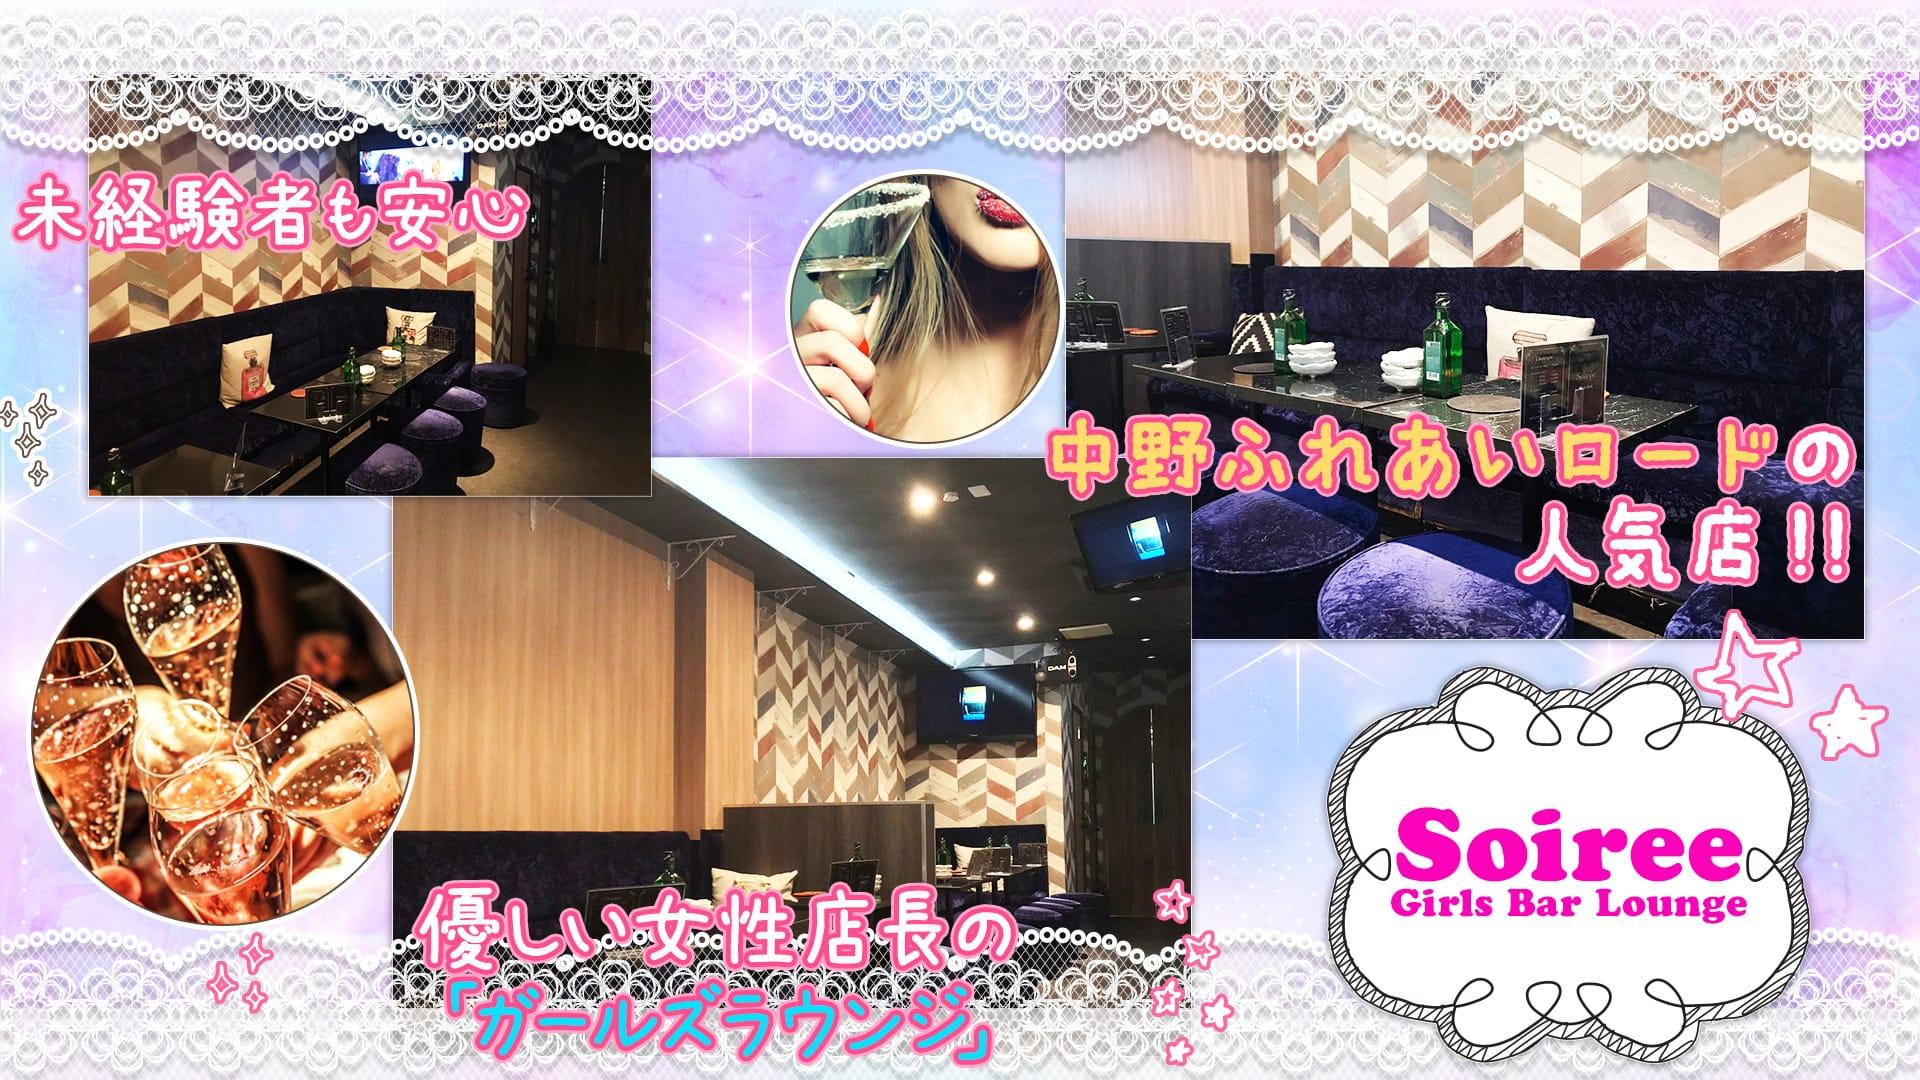 Girls Bar Lounge ソワレ 中野 ガールズバー TOP画像